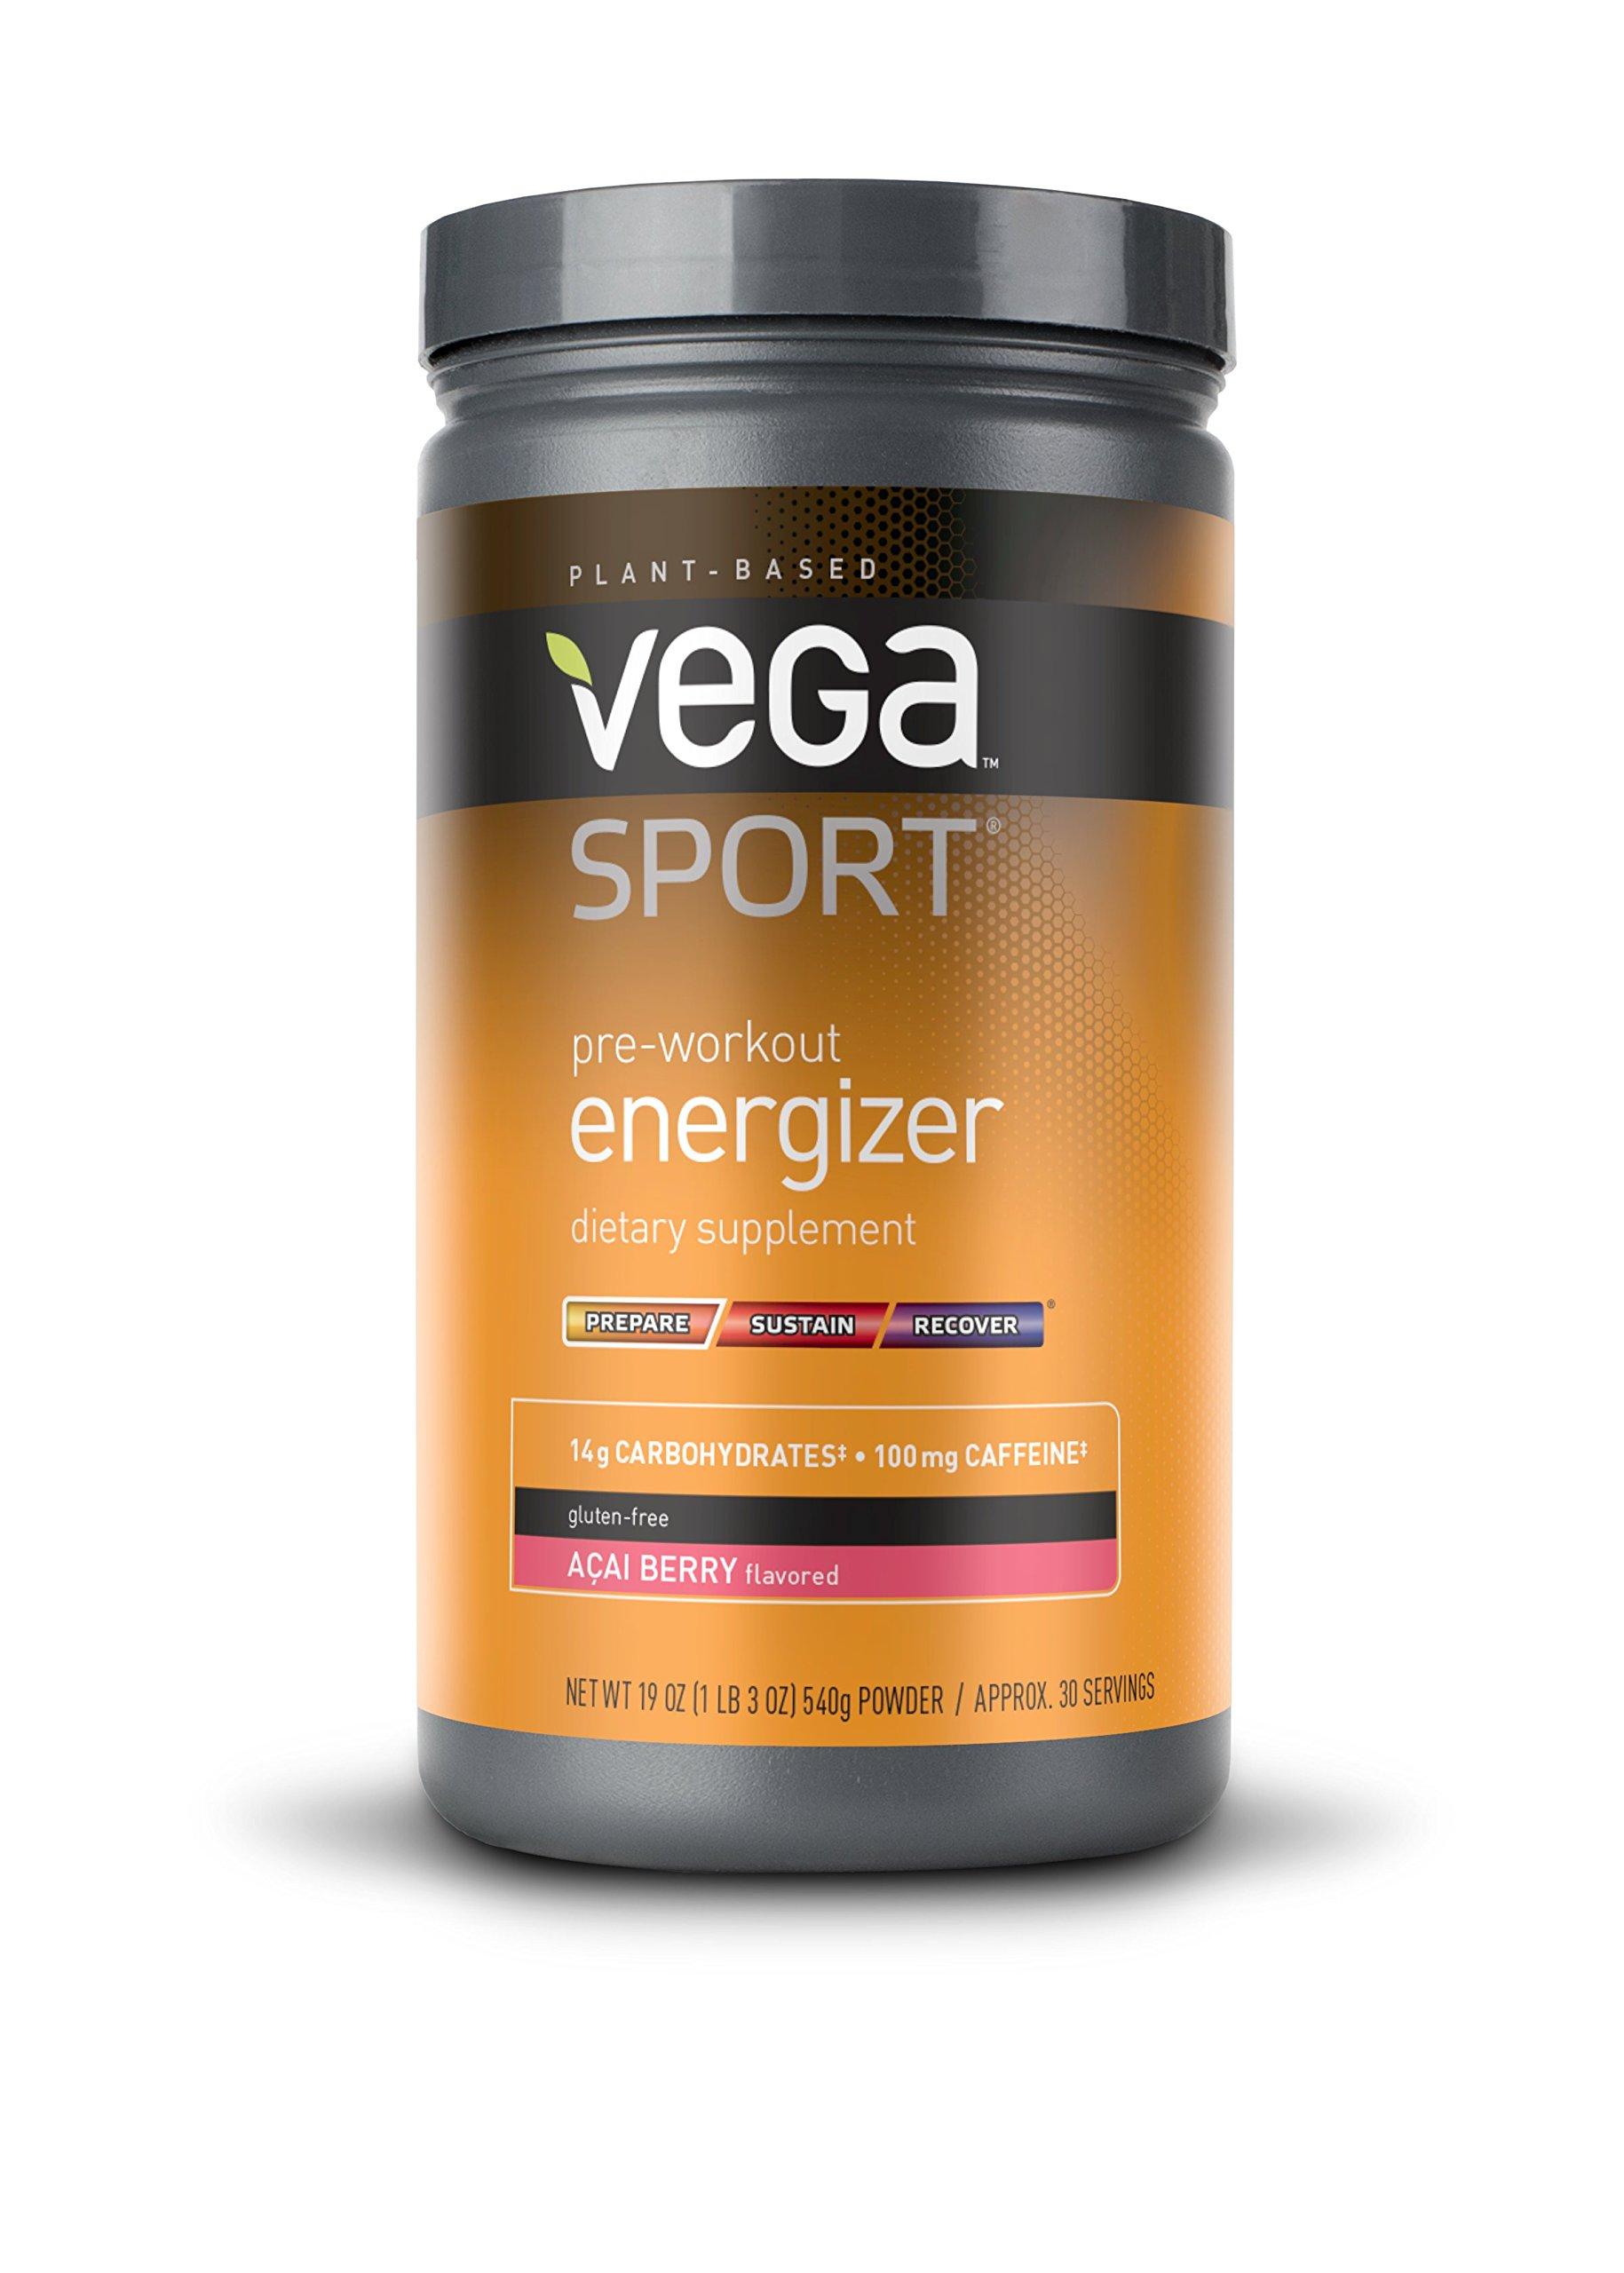 Vega Sport Pre-Workout Energizer Acai Berry (19oz, 30 Servings) - Vegan, Gluten Free, All Natural, Pre Workout Powder, Non GMO by VEGA